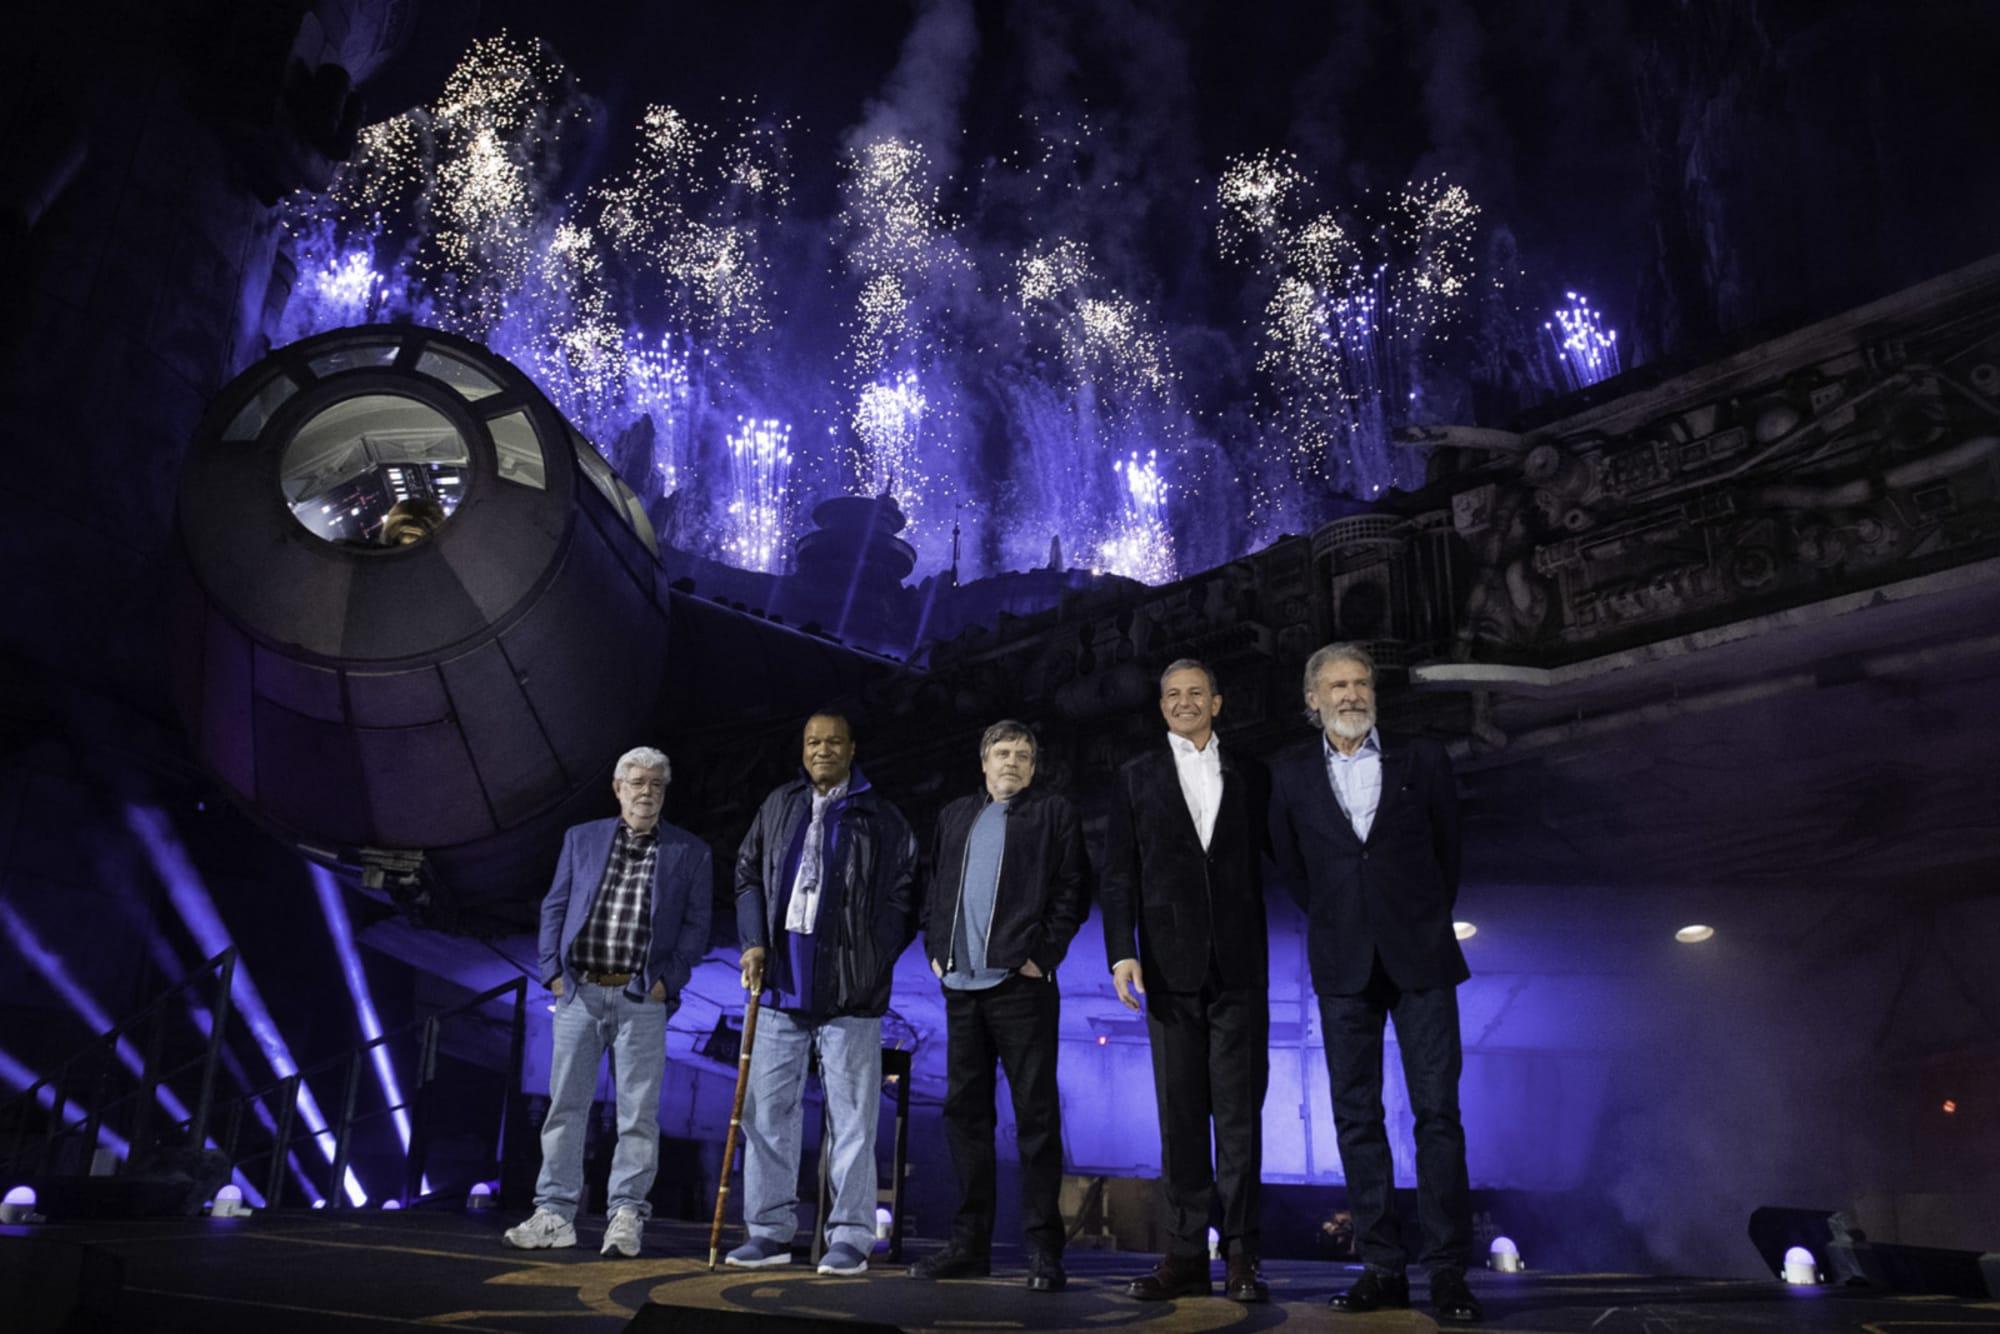 Why Star Wars: Galaxy's Edge represents a pinnacle of Disney Parks' achievements